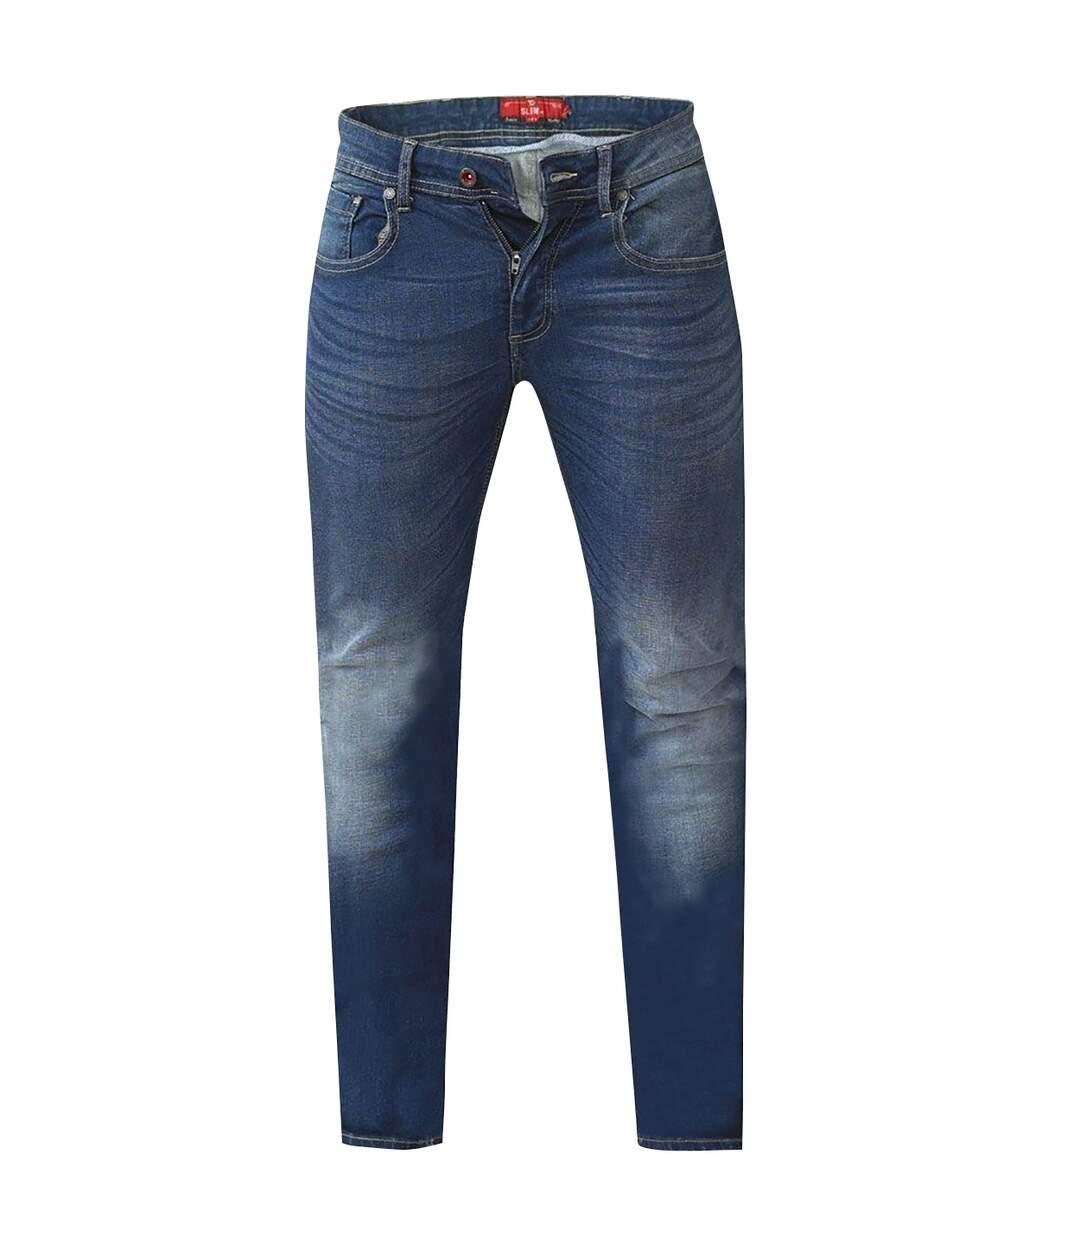 Duke Mens Ambrose King Size Tapered Fit Stretch Jeans (Vintage Blue) - UTDC180